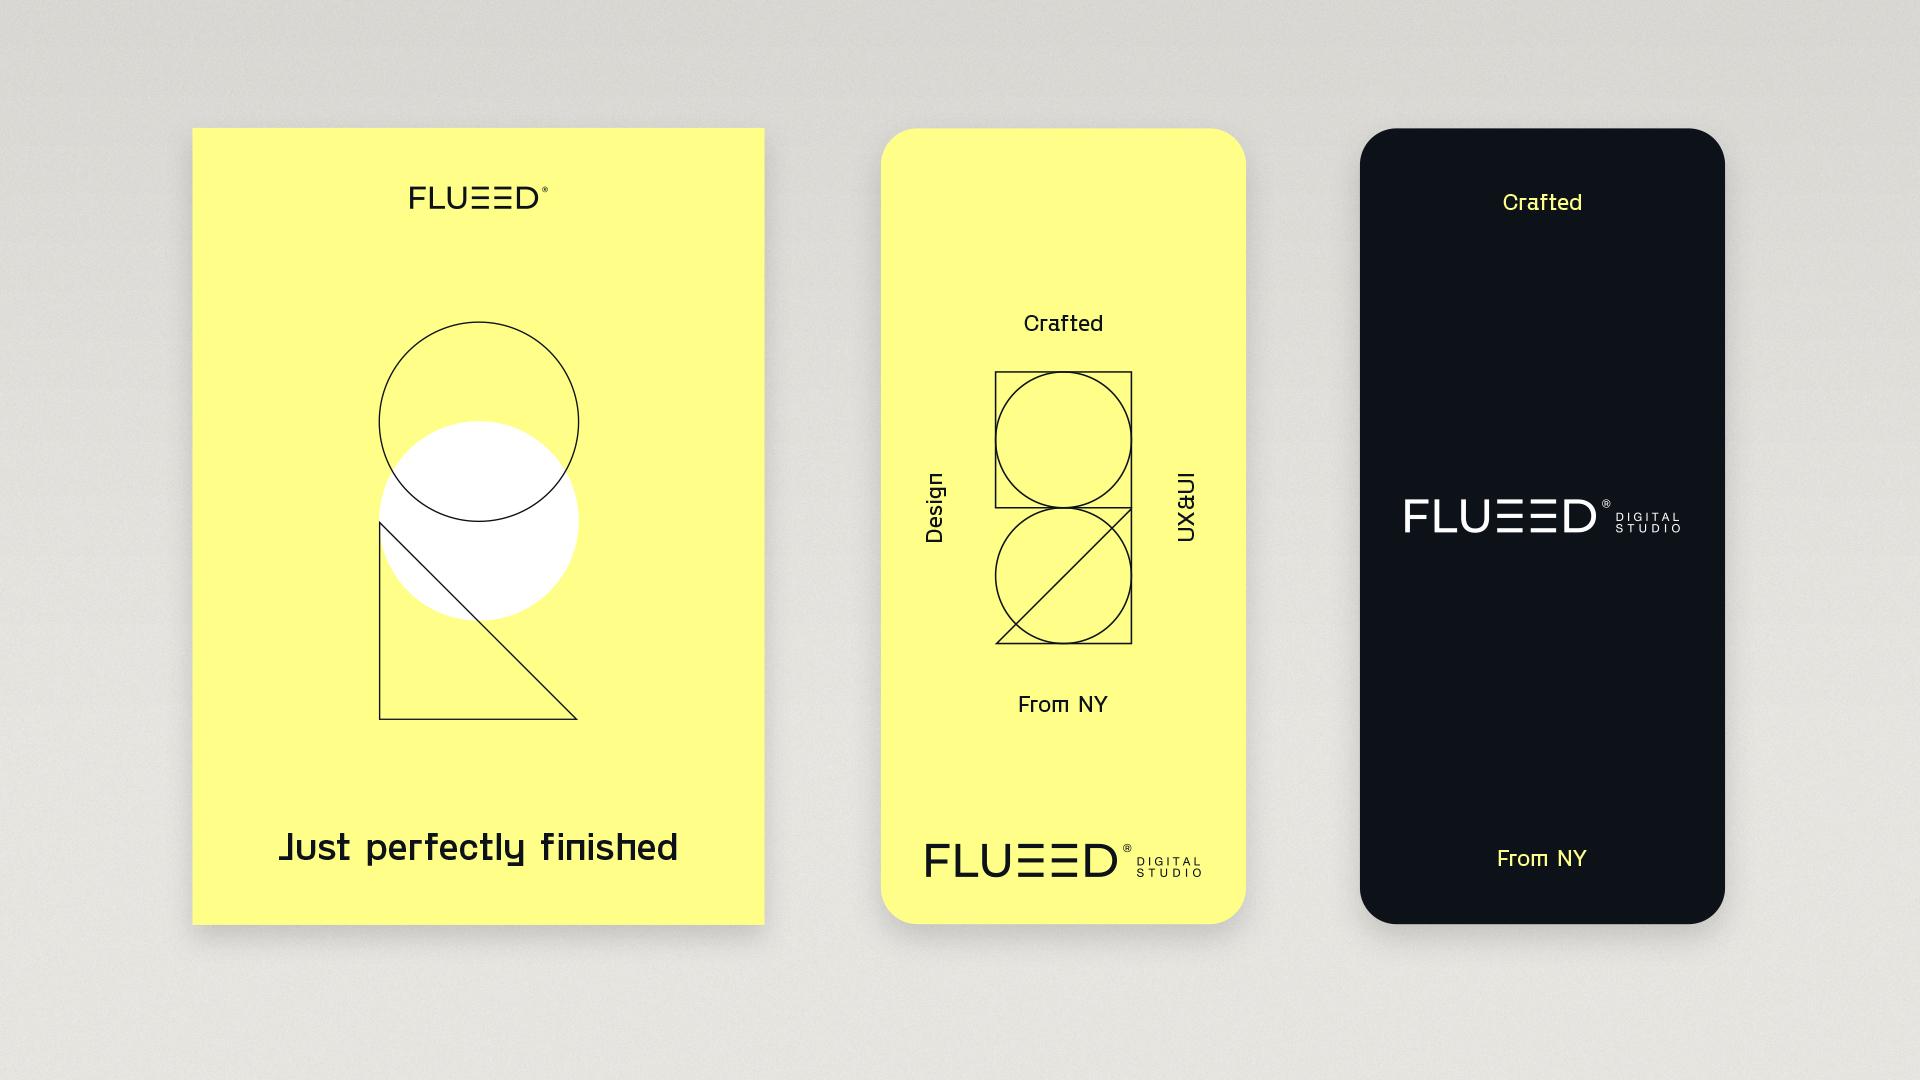 Identidad visual estudio diseño UX/UI Flueed